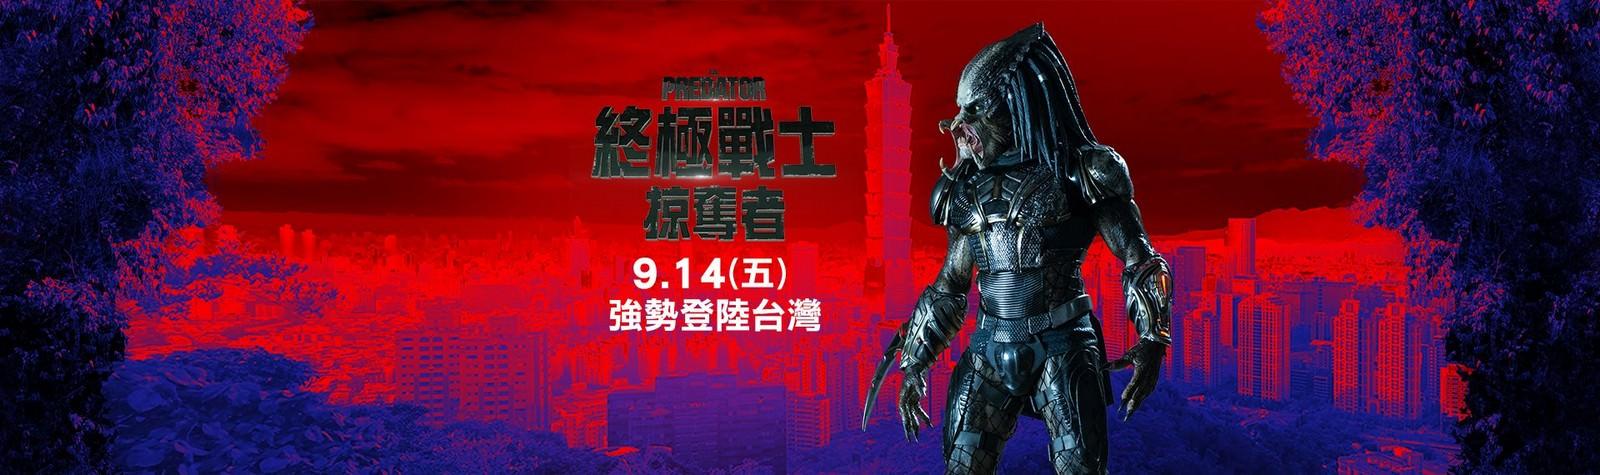 Movie, The Predator(美國, 2018) / 終極戰士:掠奪者(台) / 铁血战士(中) / 鐵血戰士:血獸進化(港), 電影海報, 台灣, 橫版